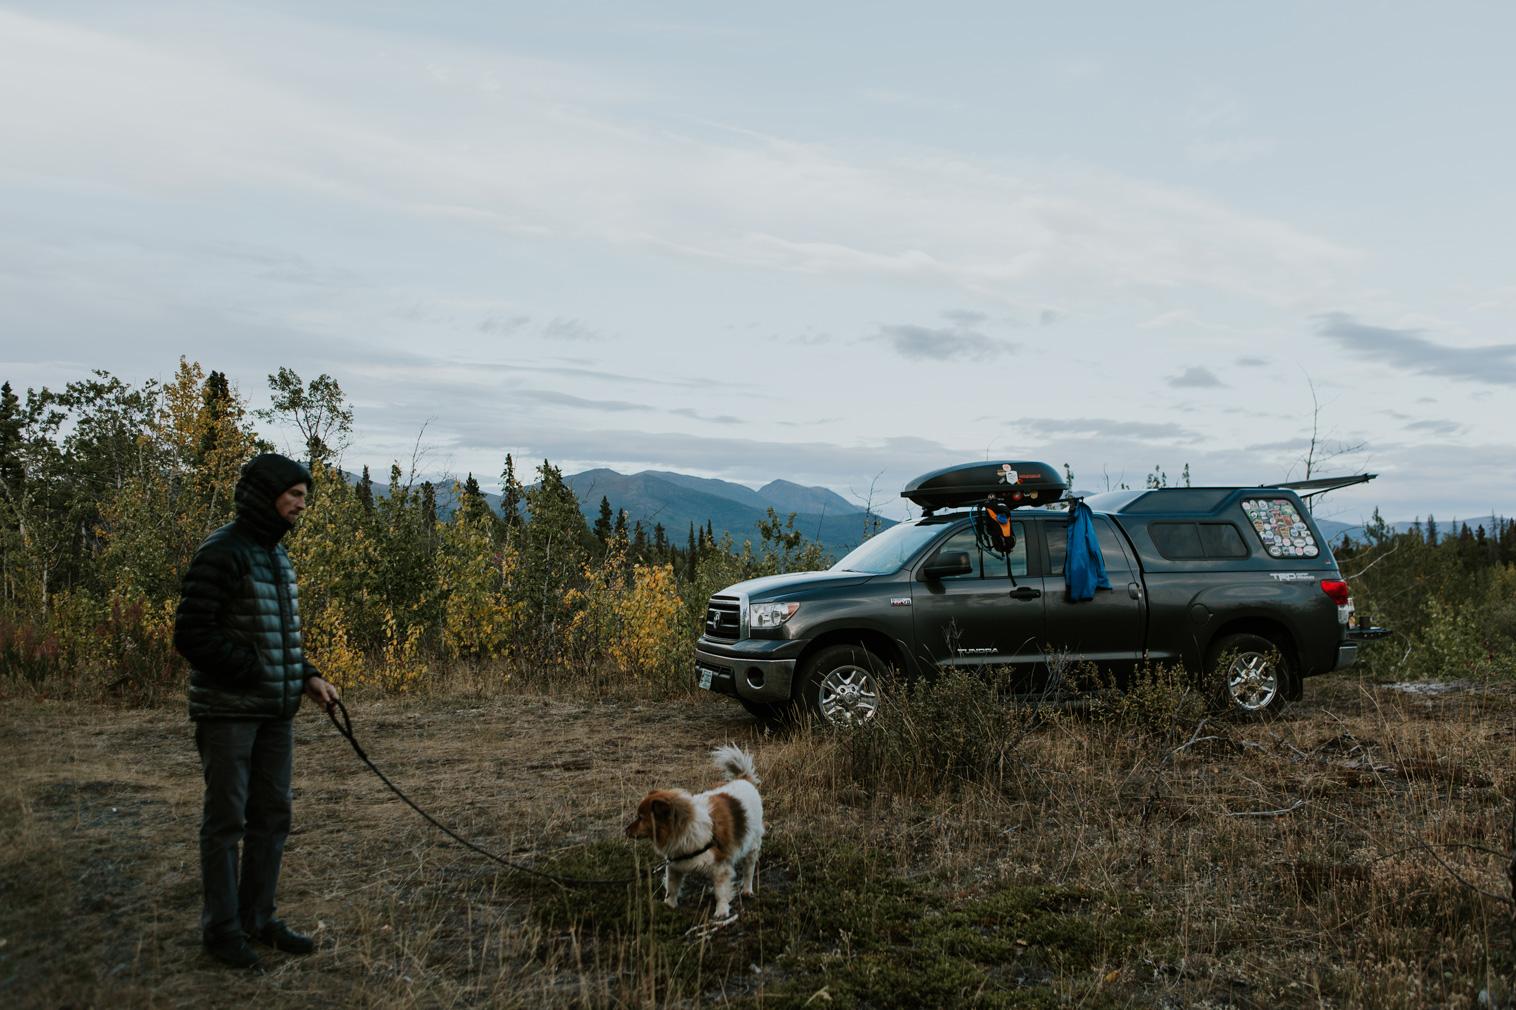 CindyGiovagnoli_BritishColumbia_Yukon_Alaska_roadtrip_AlCan_Alaskan_Highway_truck_camping-035.jpg